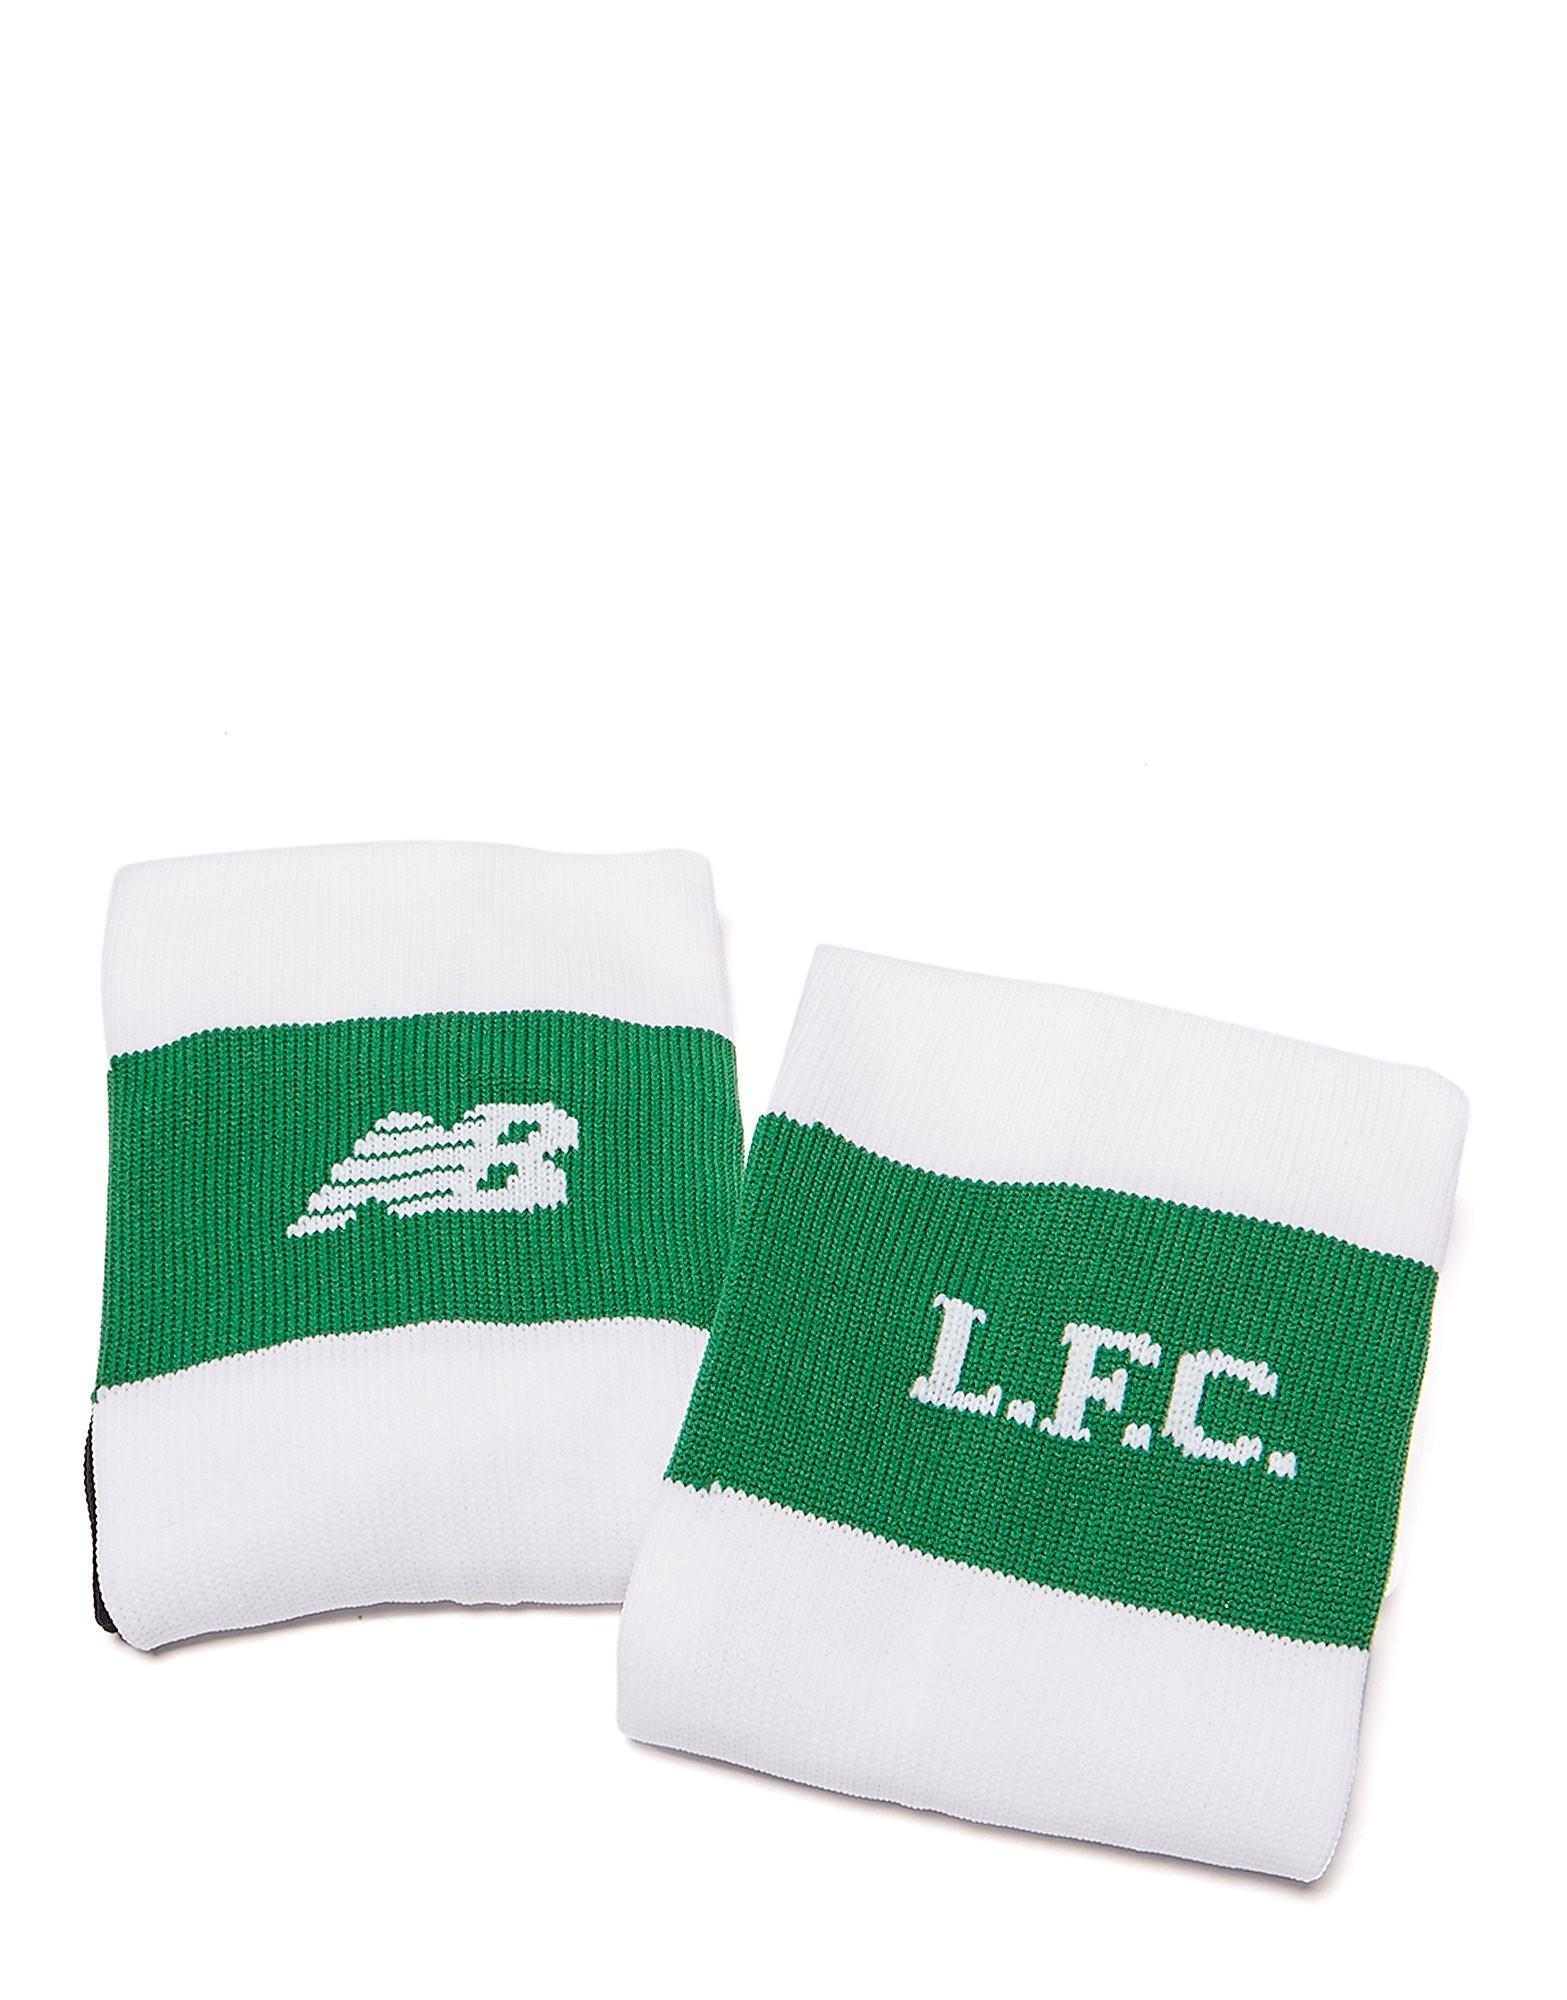 New Balance calcetines Liverpool FC 2017/18 2.ª equipación júnior